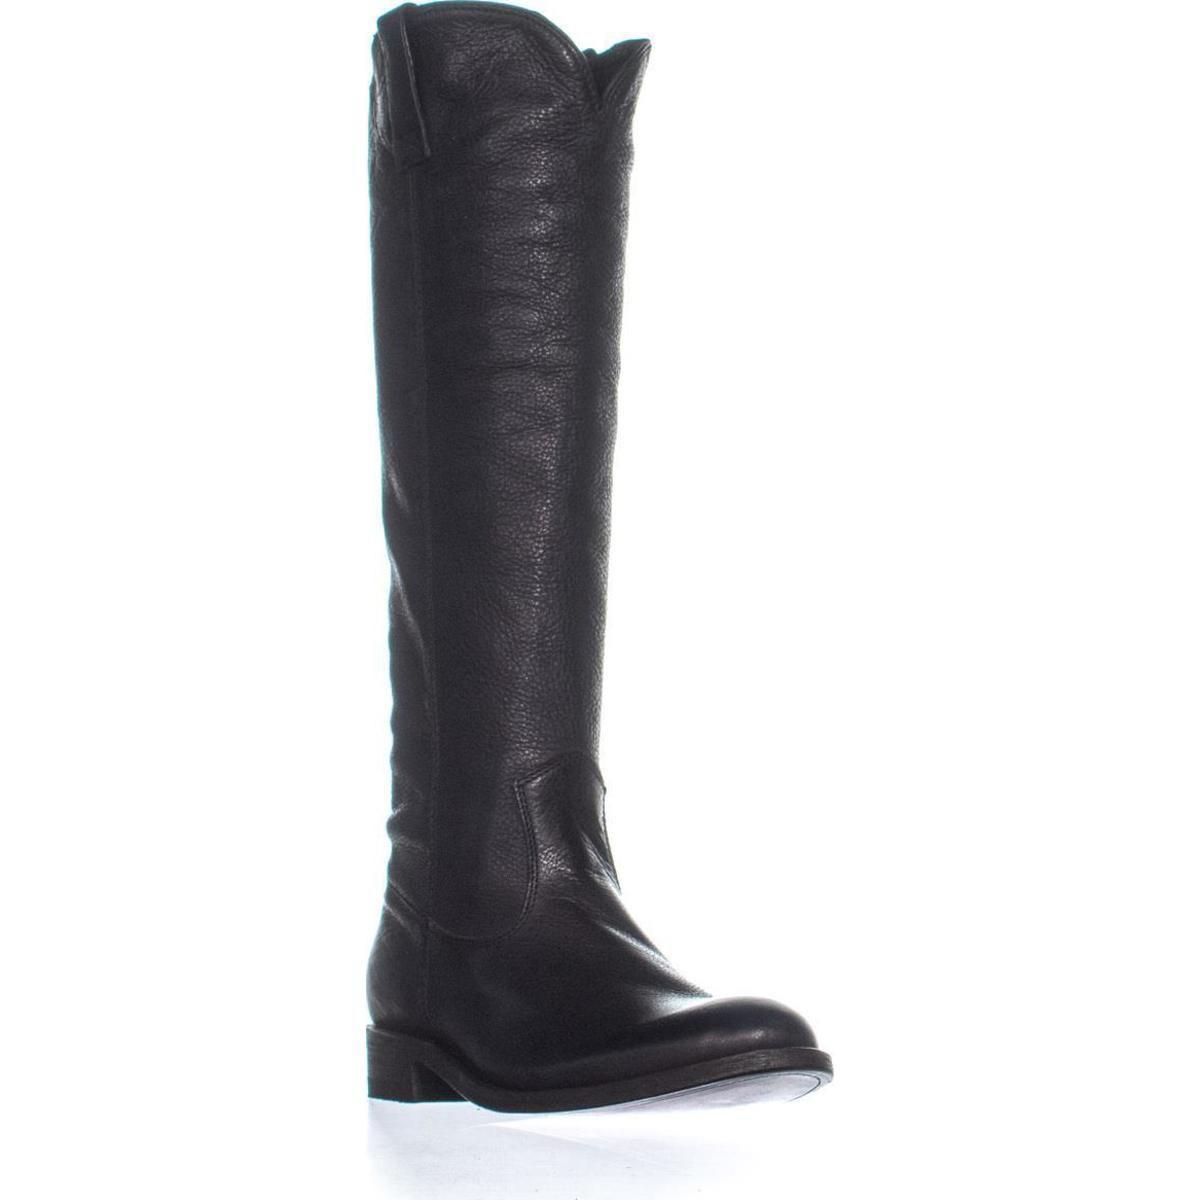 edeb03a958e Dolce Vita. Women s Lujan Knee-high Riding Boots